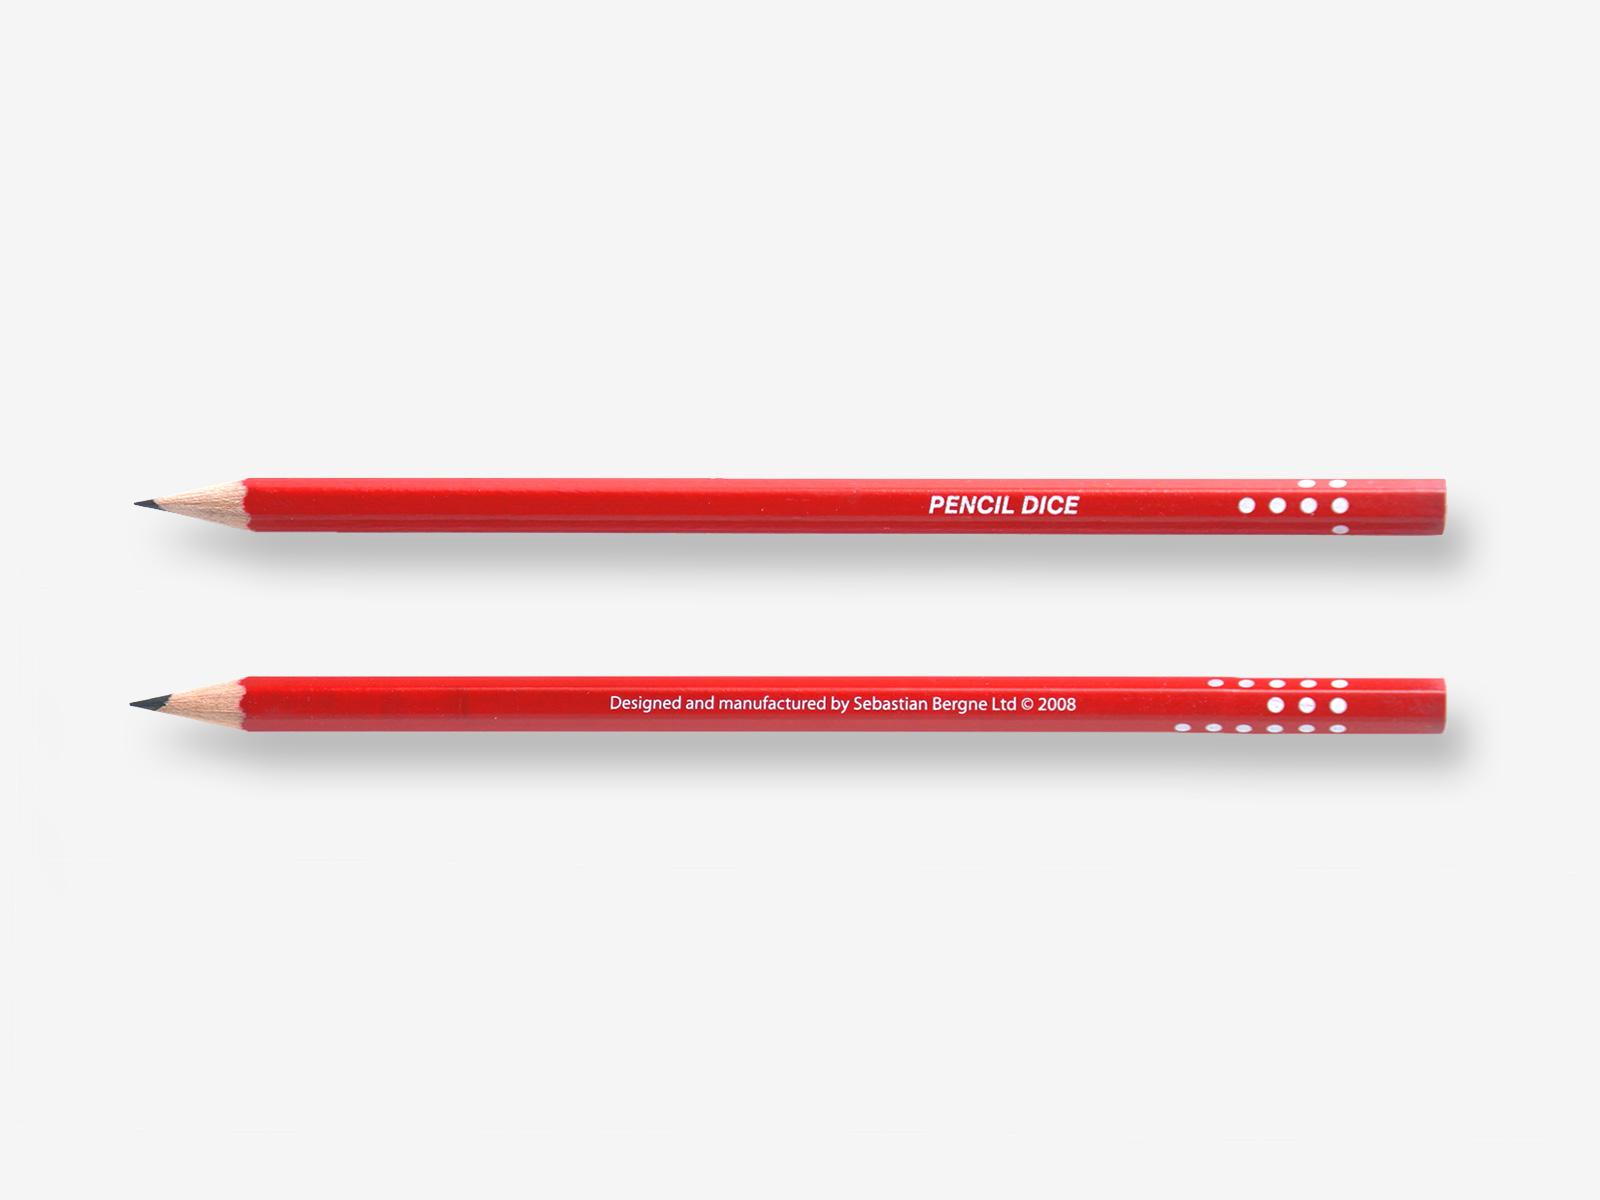 Pencil Dice | sebastianbergne.com